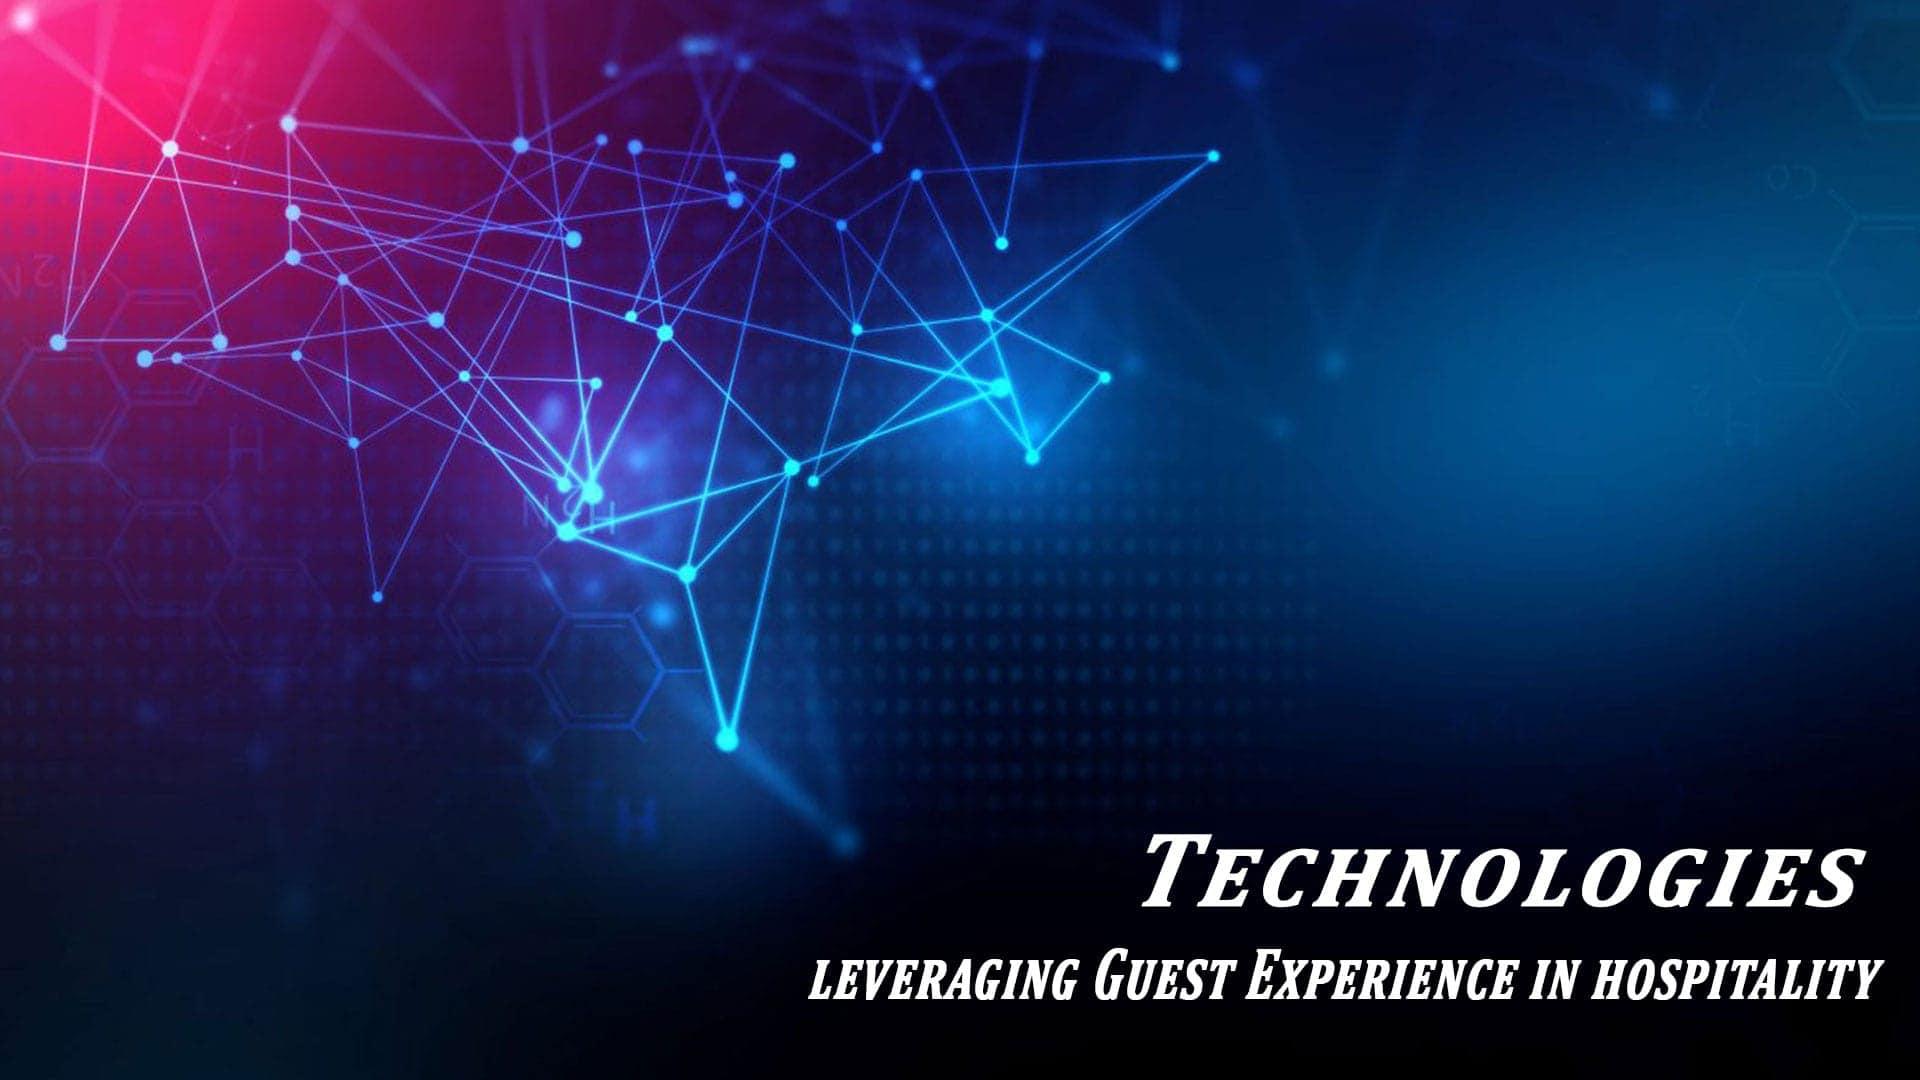 Hospitality technologies